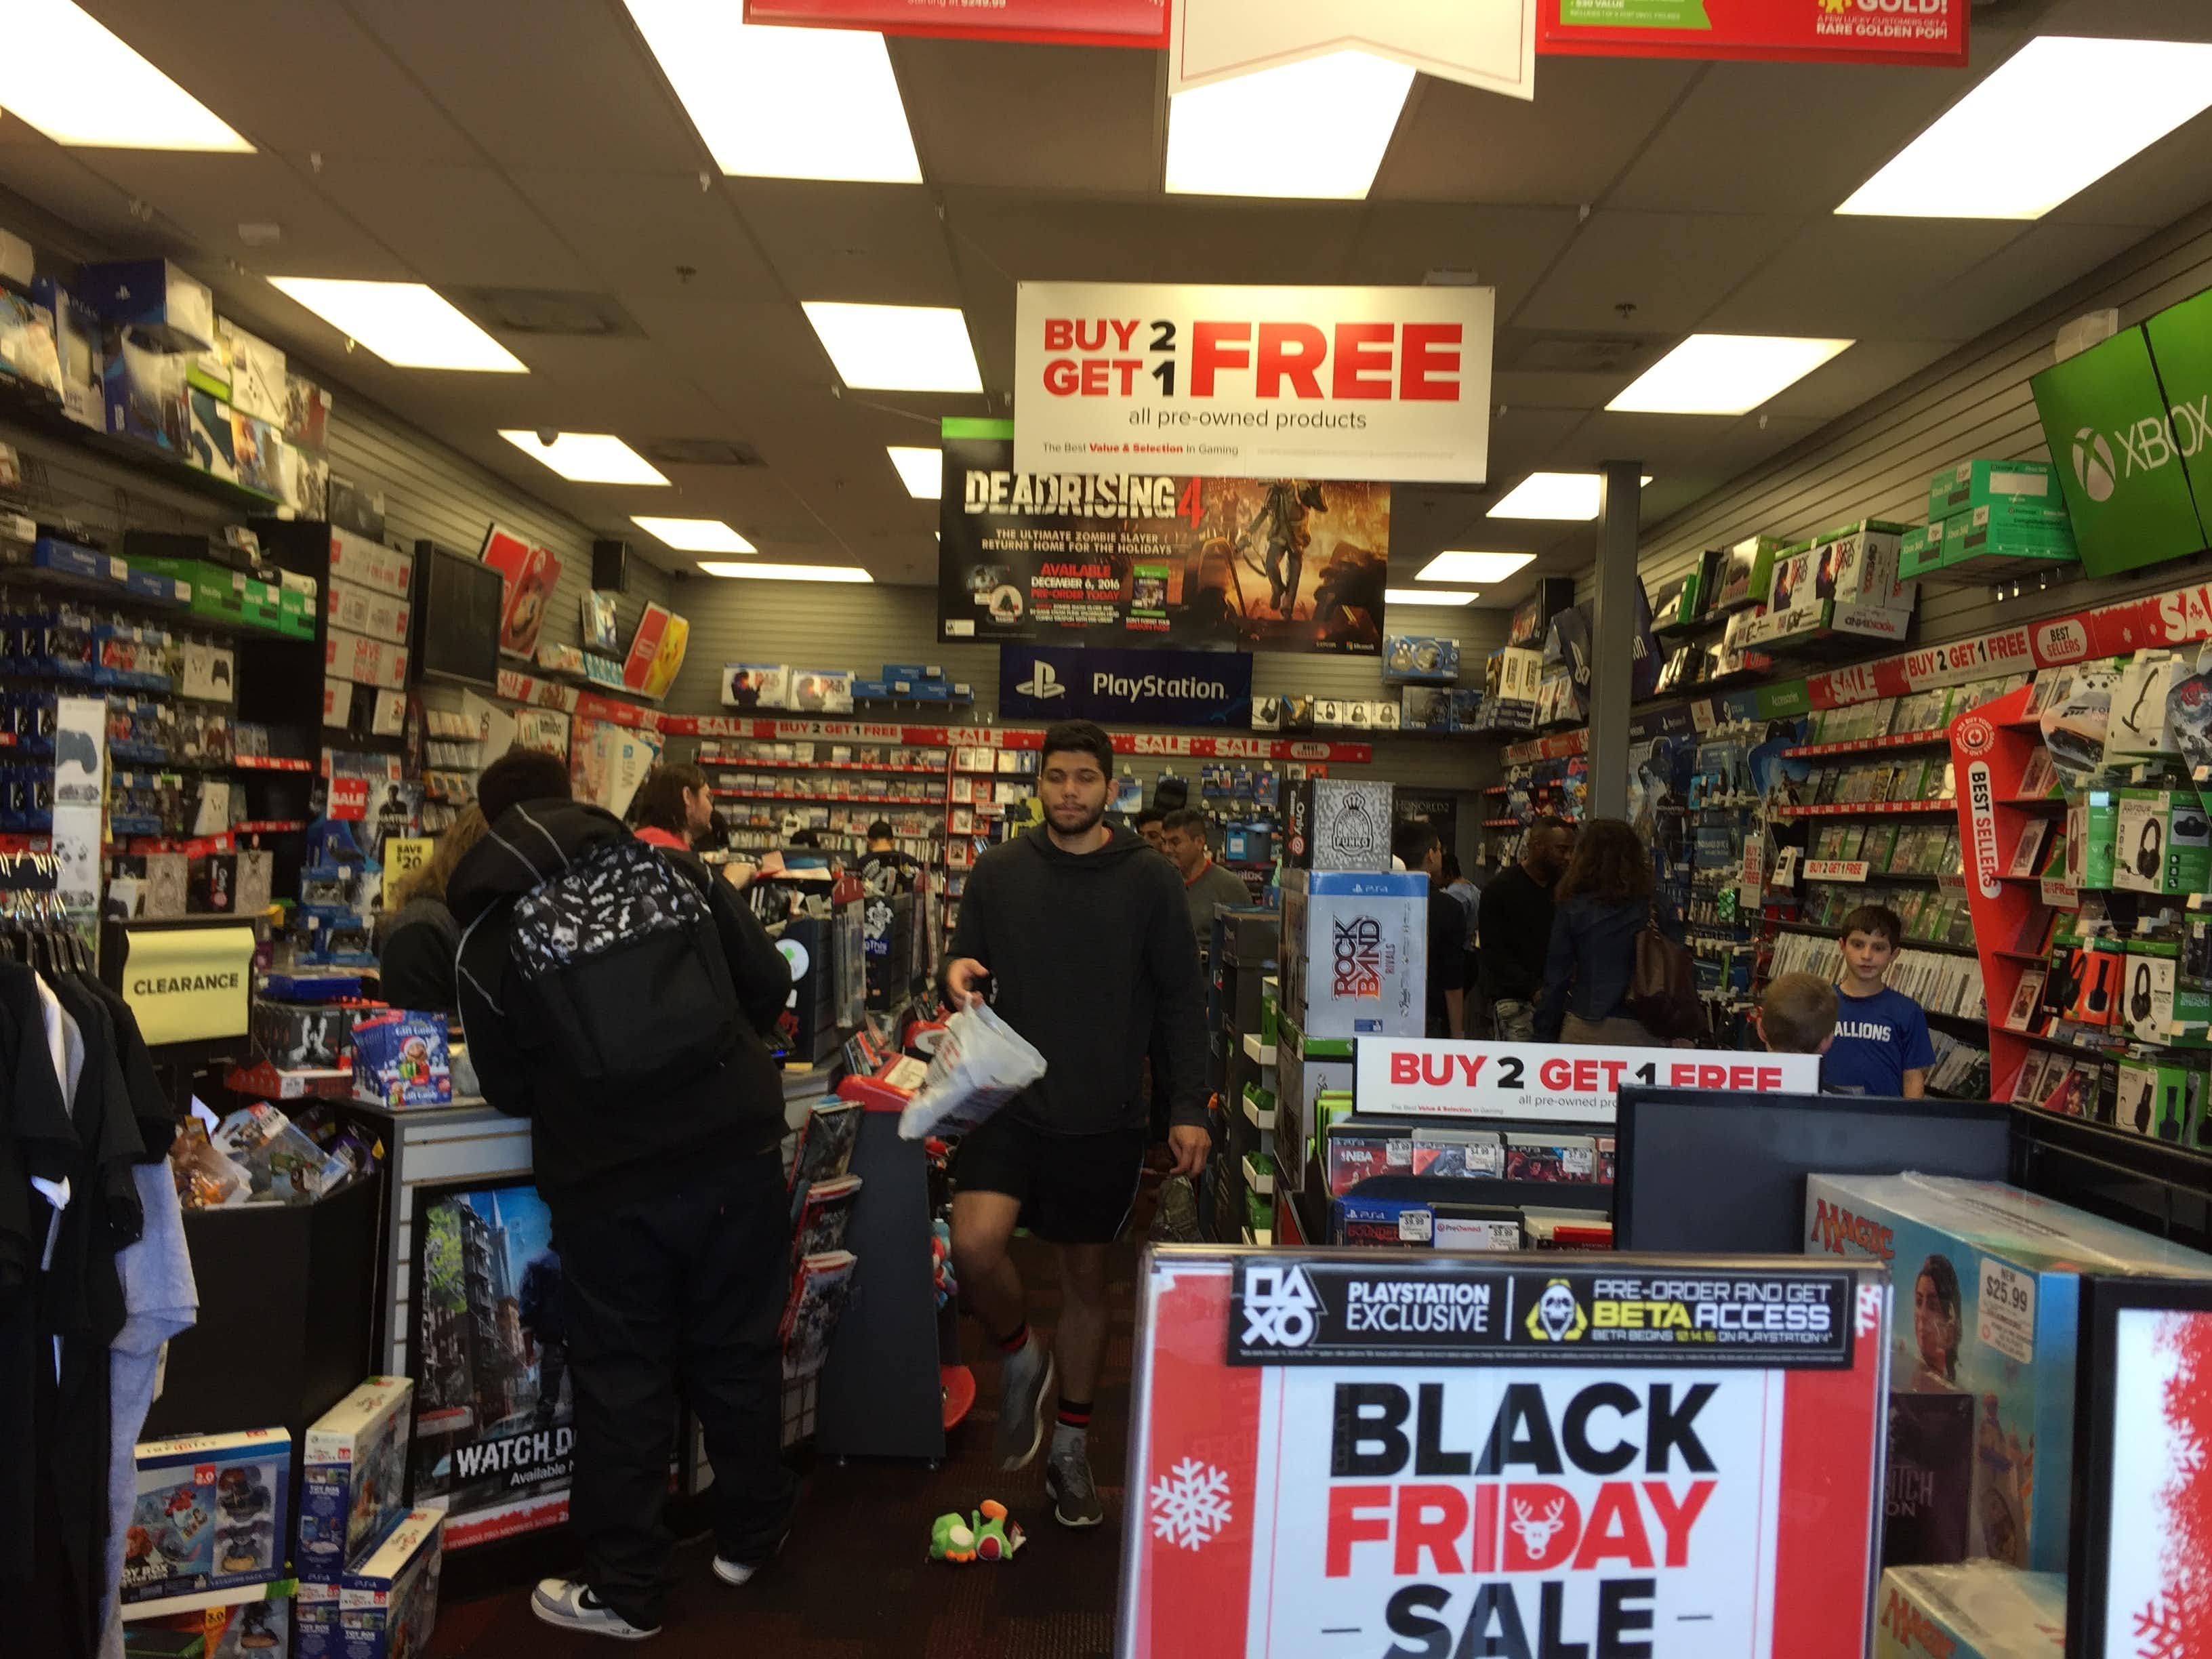 Black Friday 2016 at the GameStop in Timber Creek Crossing in Dallas.DMN staff